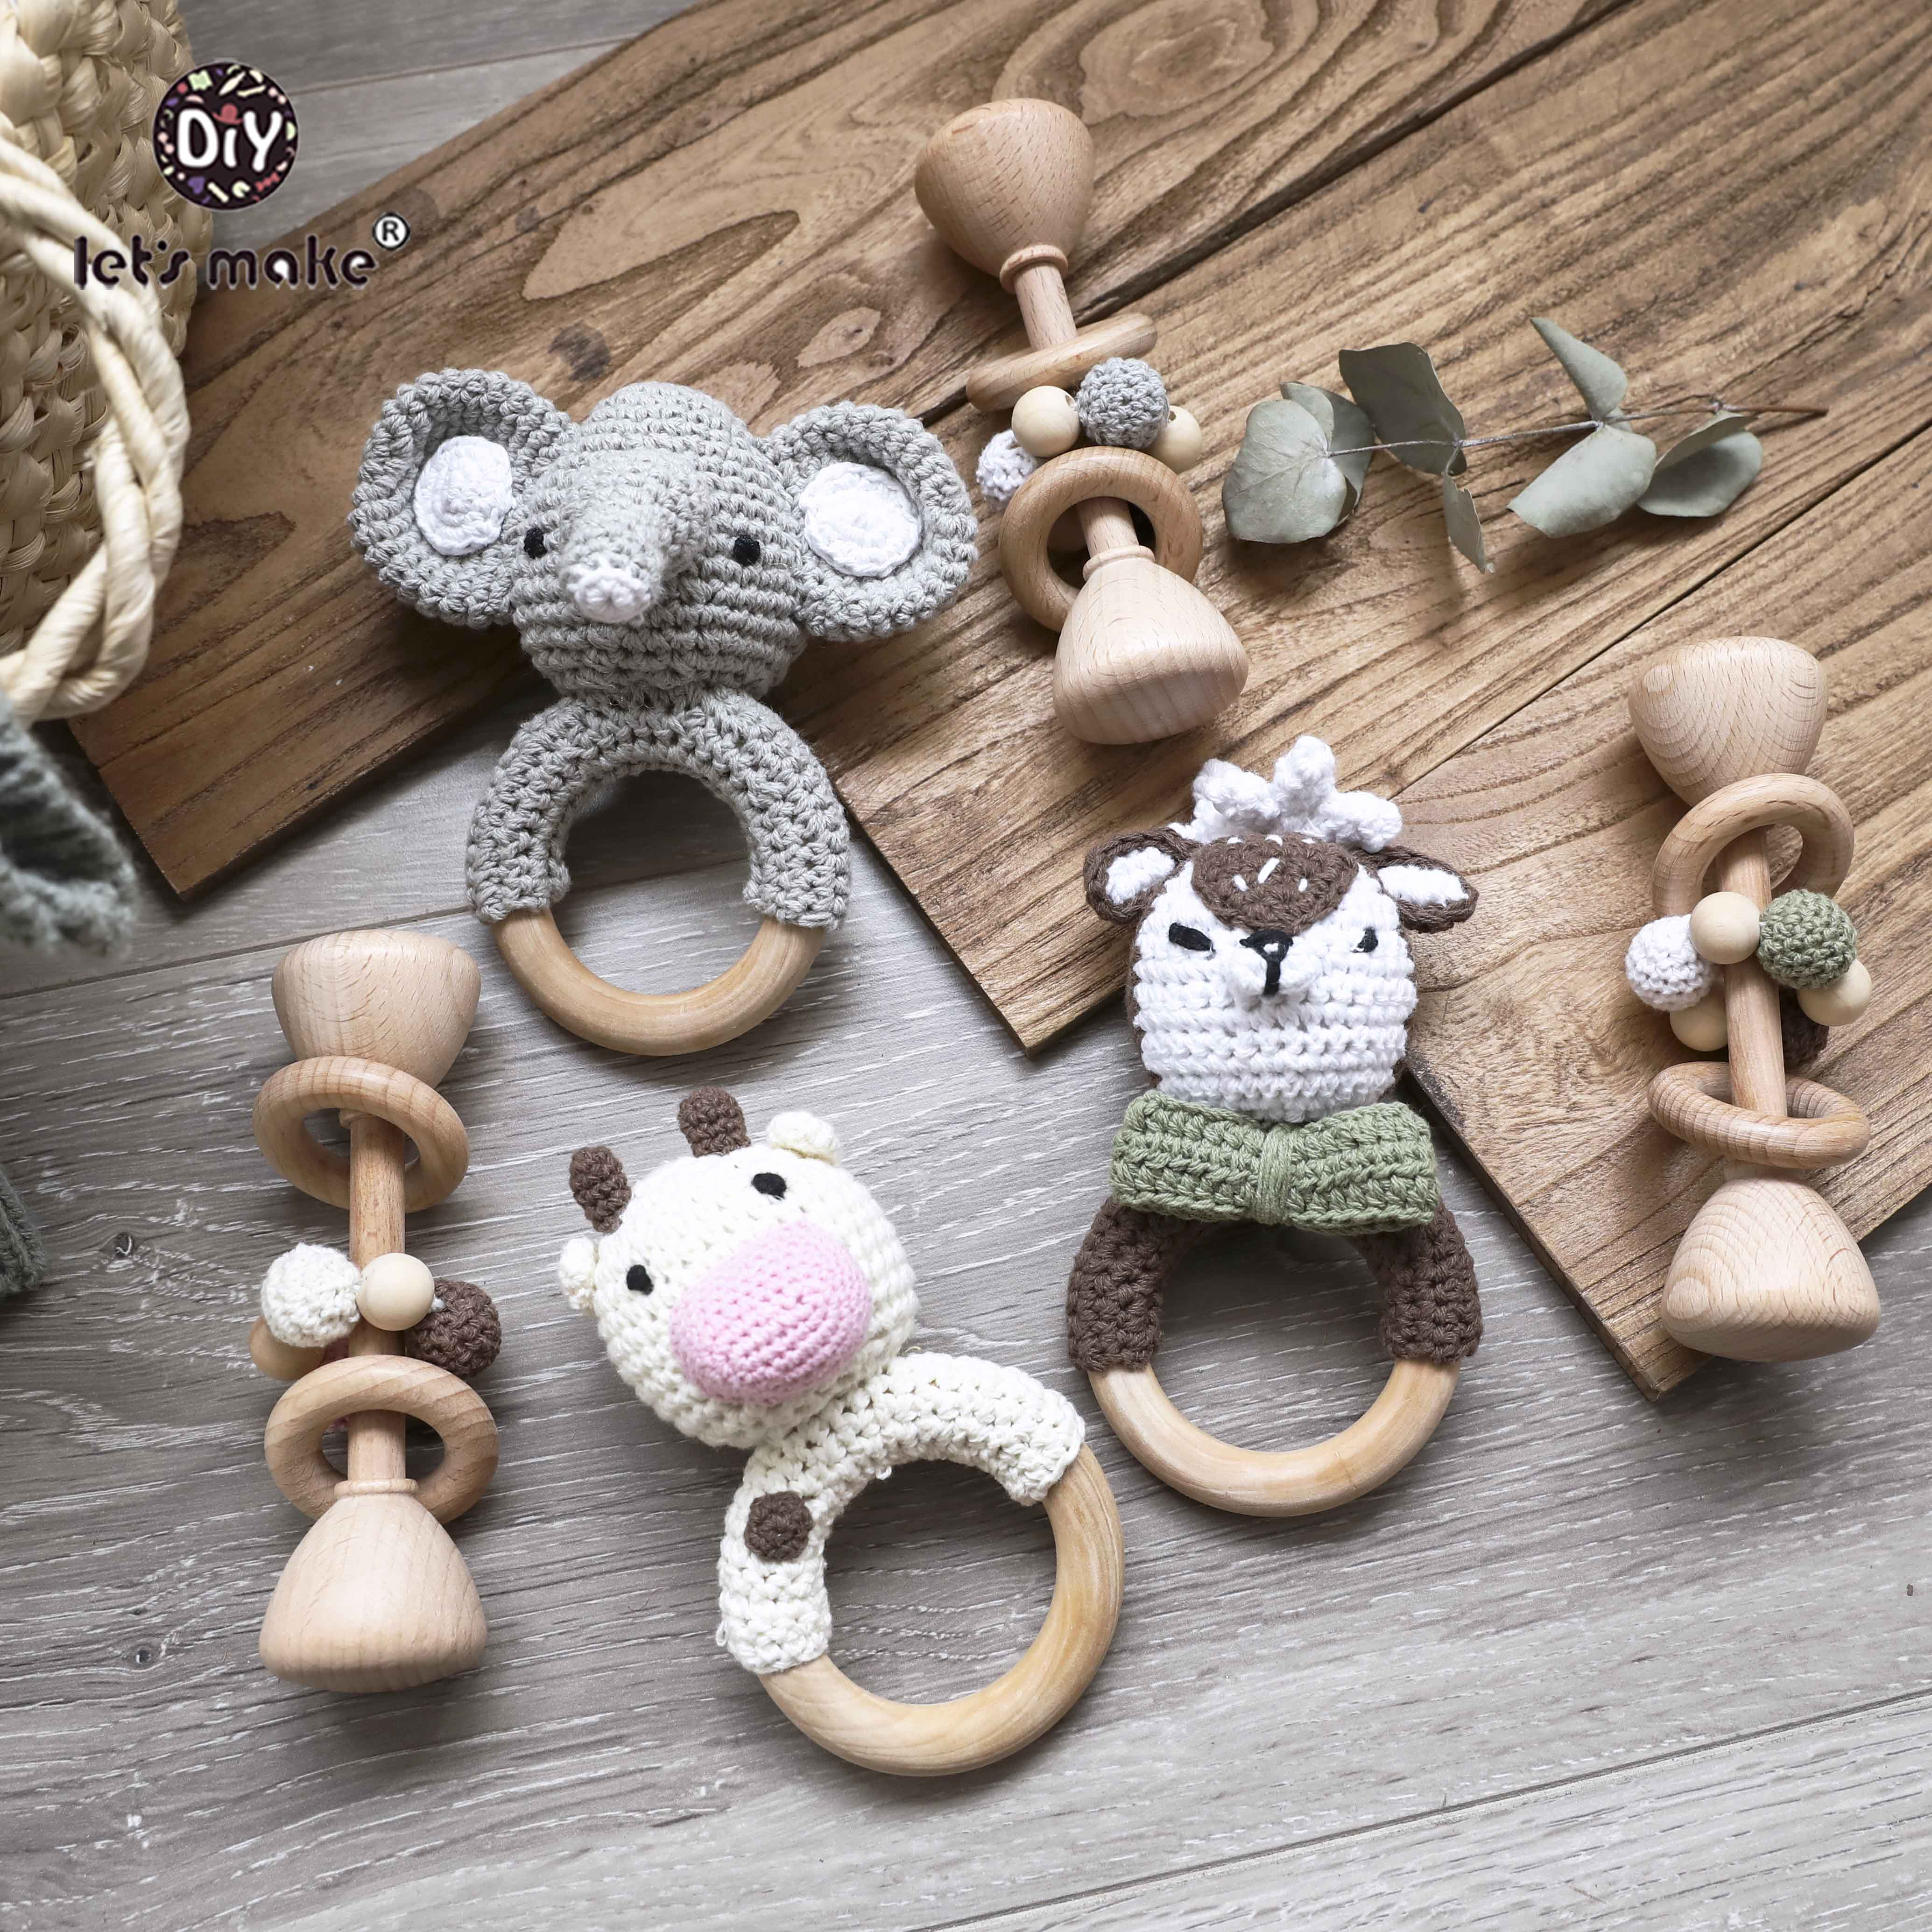 Let's Make 2pcs Wooden Baby Toys Set Wooden Beads Woven Wood Ring Kit Gym Wood Animal Rattles Wooden Teether BPA Free Kids Toys